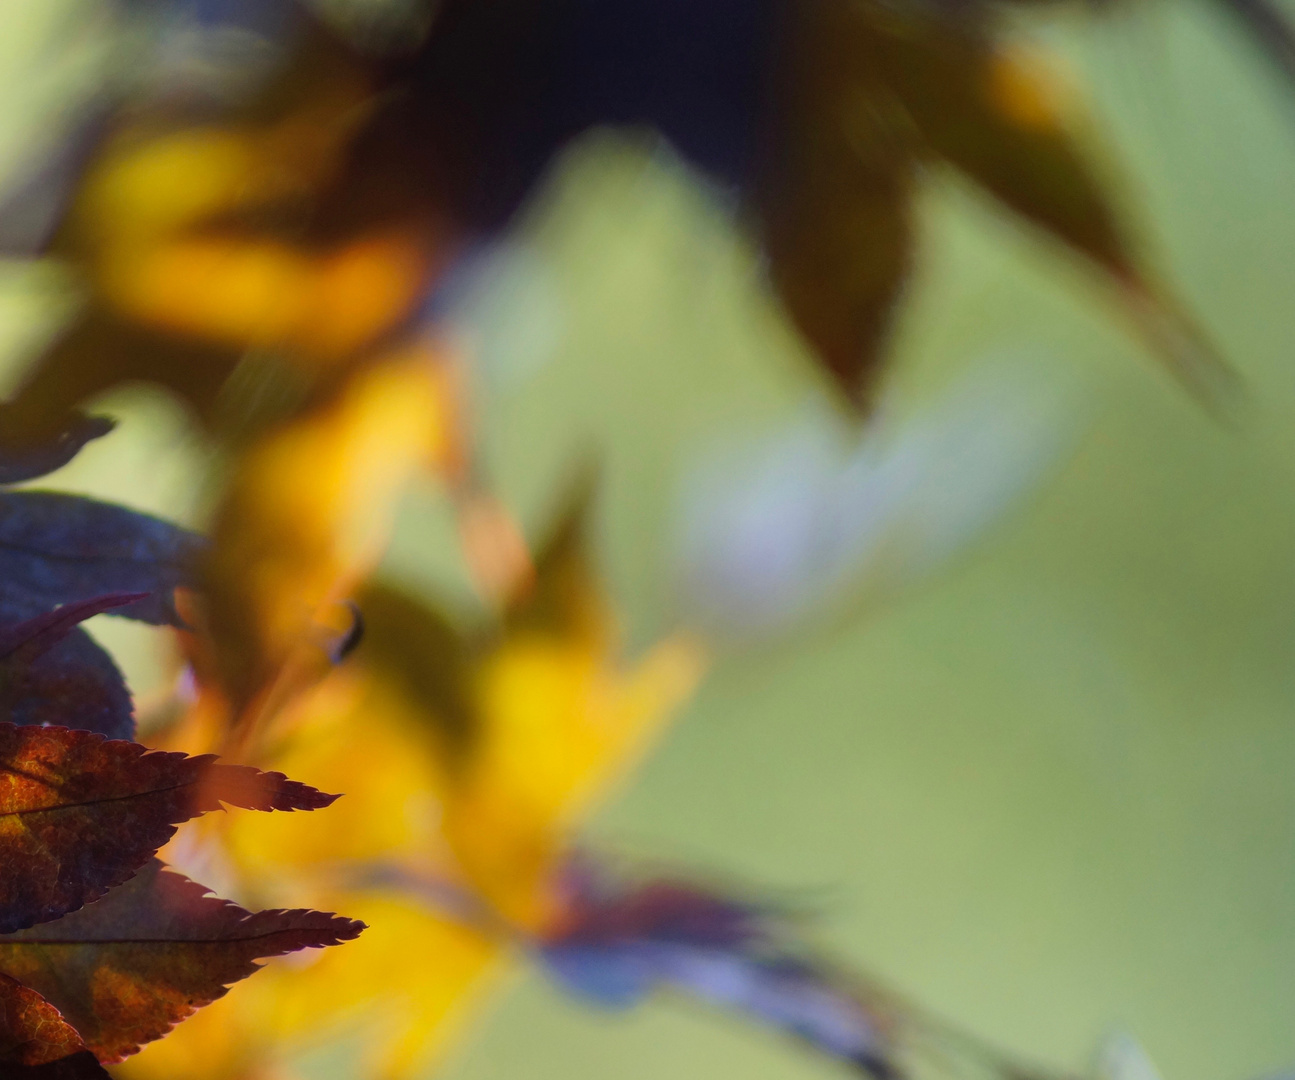 Herbstfarbspiel